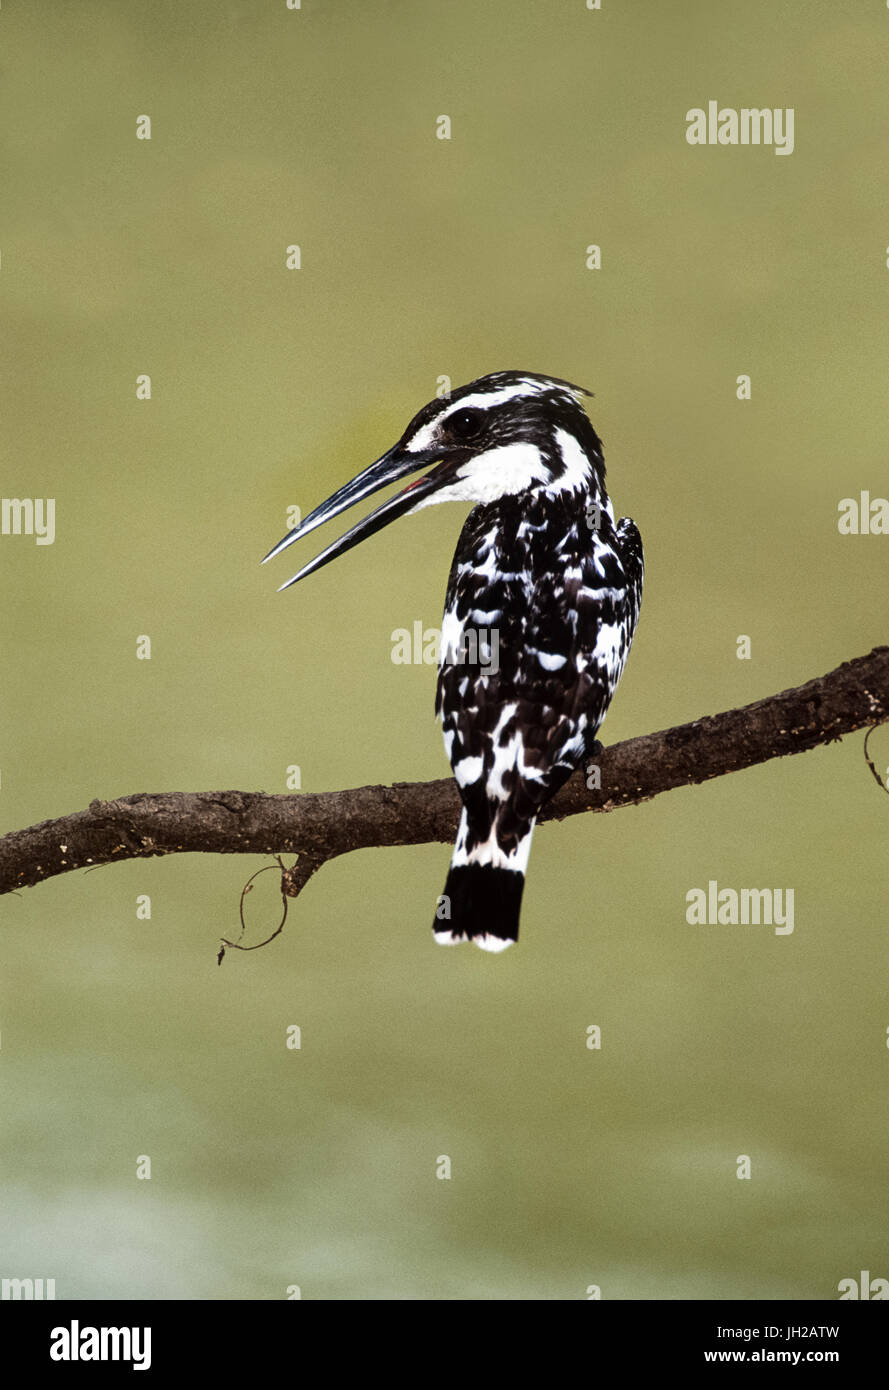 Pied Kingfisher or Water Kingfisher (Ceryle rudis), Keoladeo Ghana National Park, Bharatpur, Rajsthan, India - Stock Image